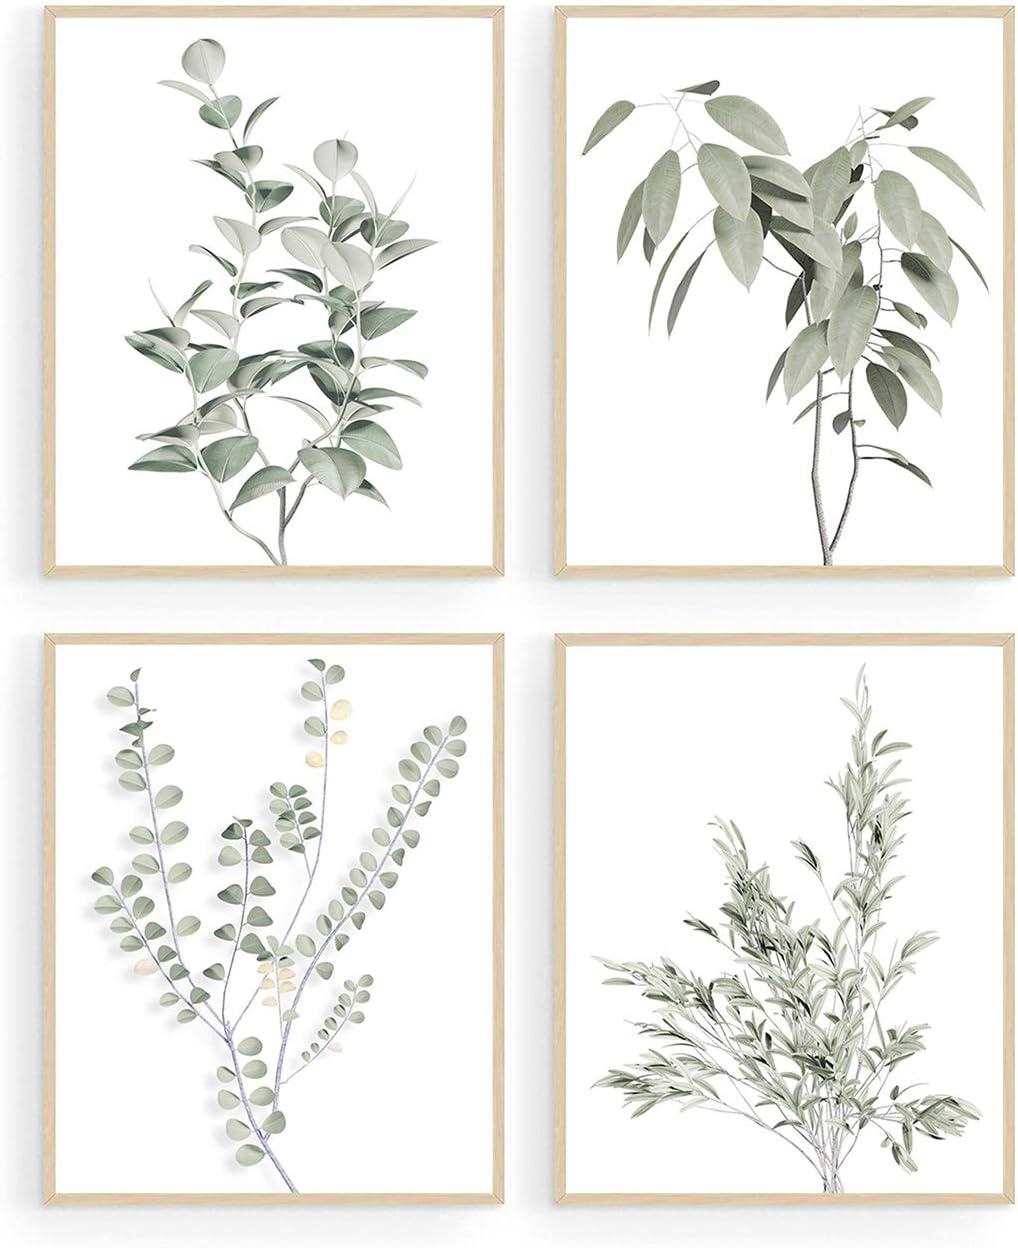 Botanical Plant Wall Art Prints, Minimalist Wall Art, Boho Wall Decor, Green Leaves Eucalyptus Pictures Poster, Plant Wall Decor, Bathroom Wall Decor, Kitchen Wall Decor (Set of 4, 8X10in, Unframed)